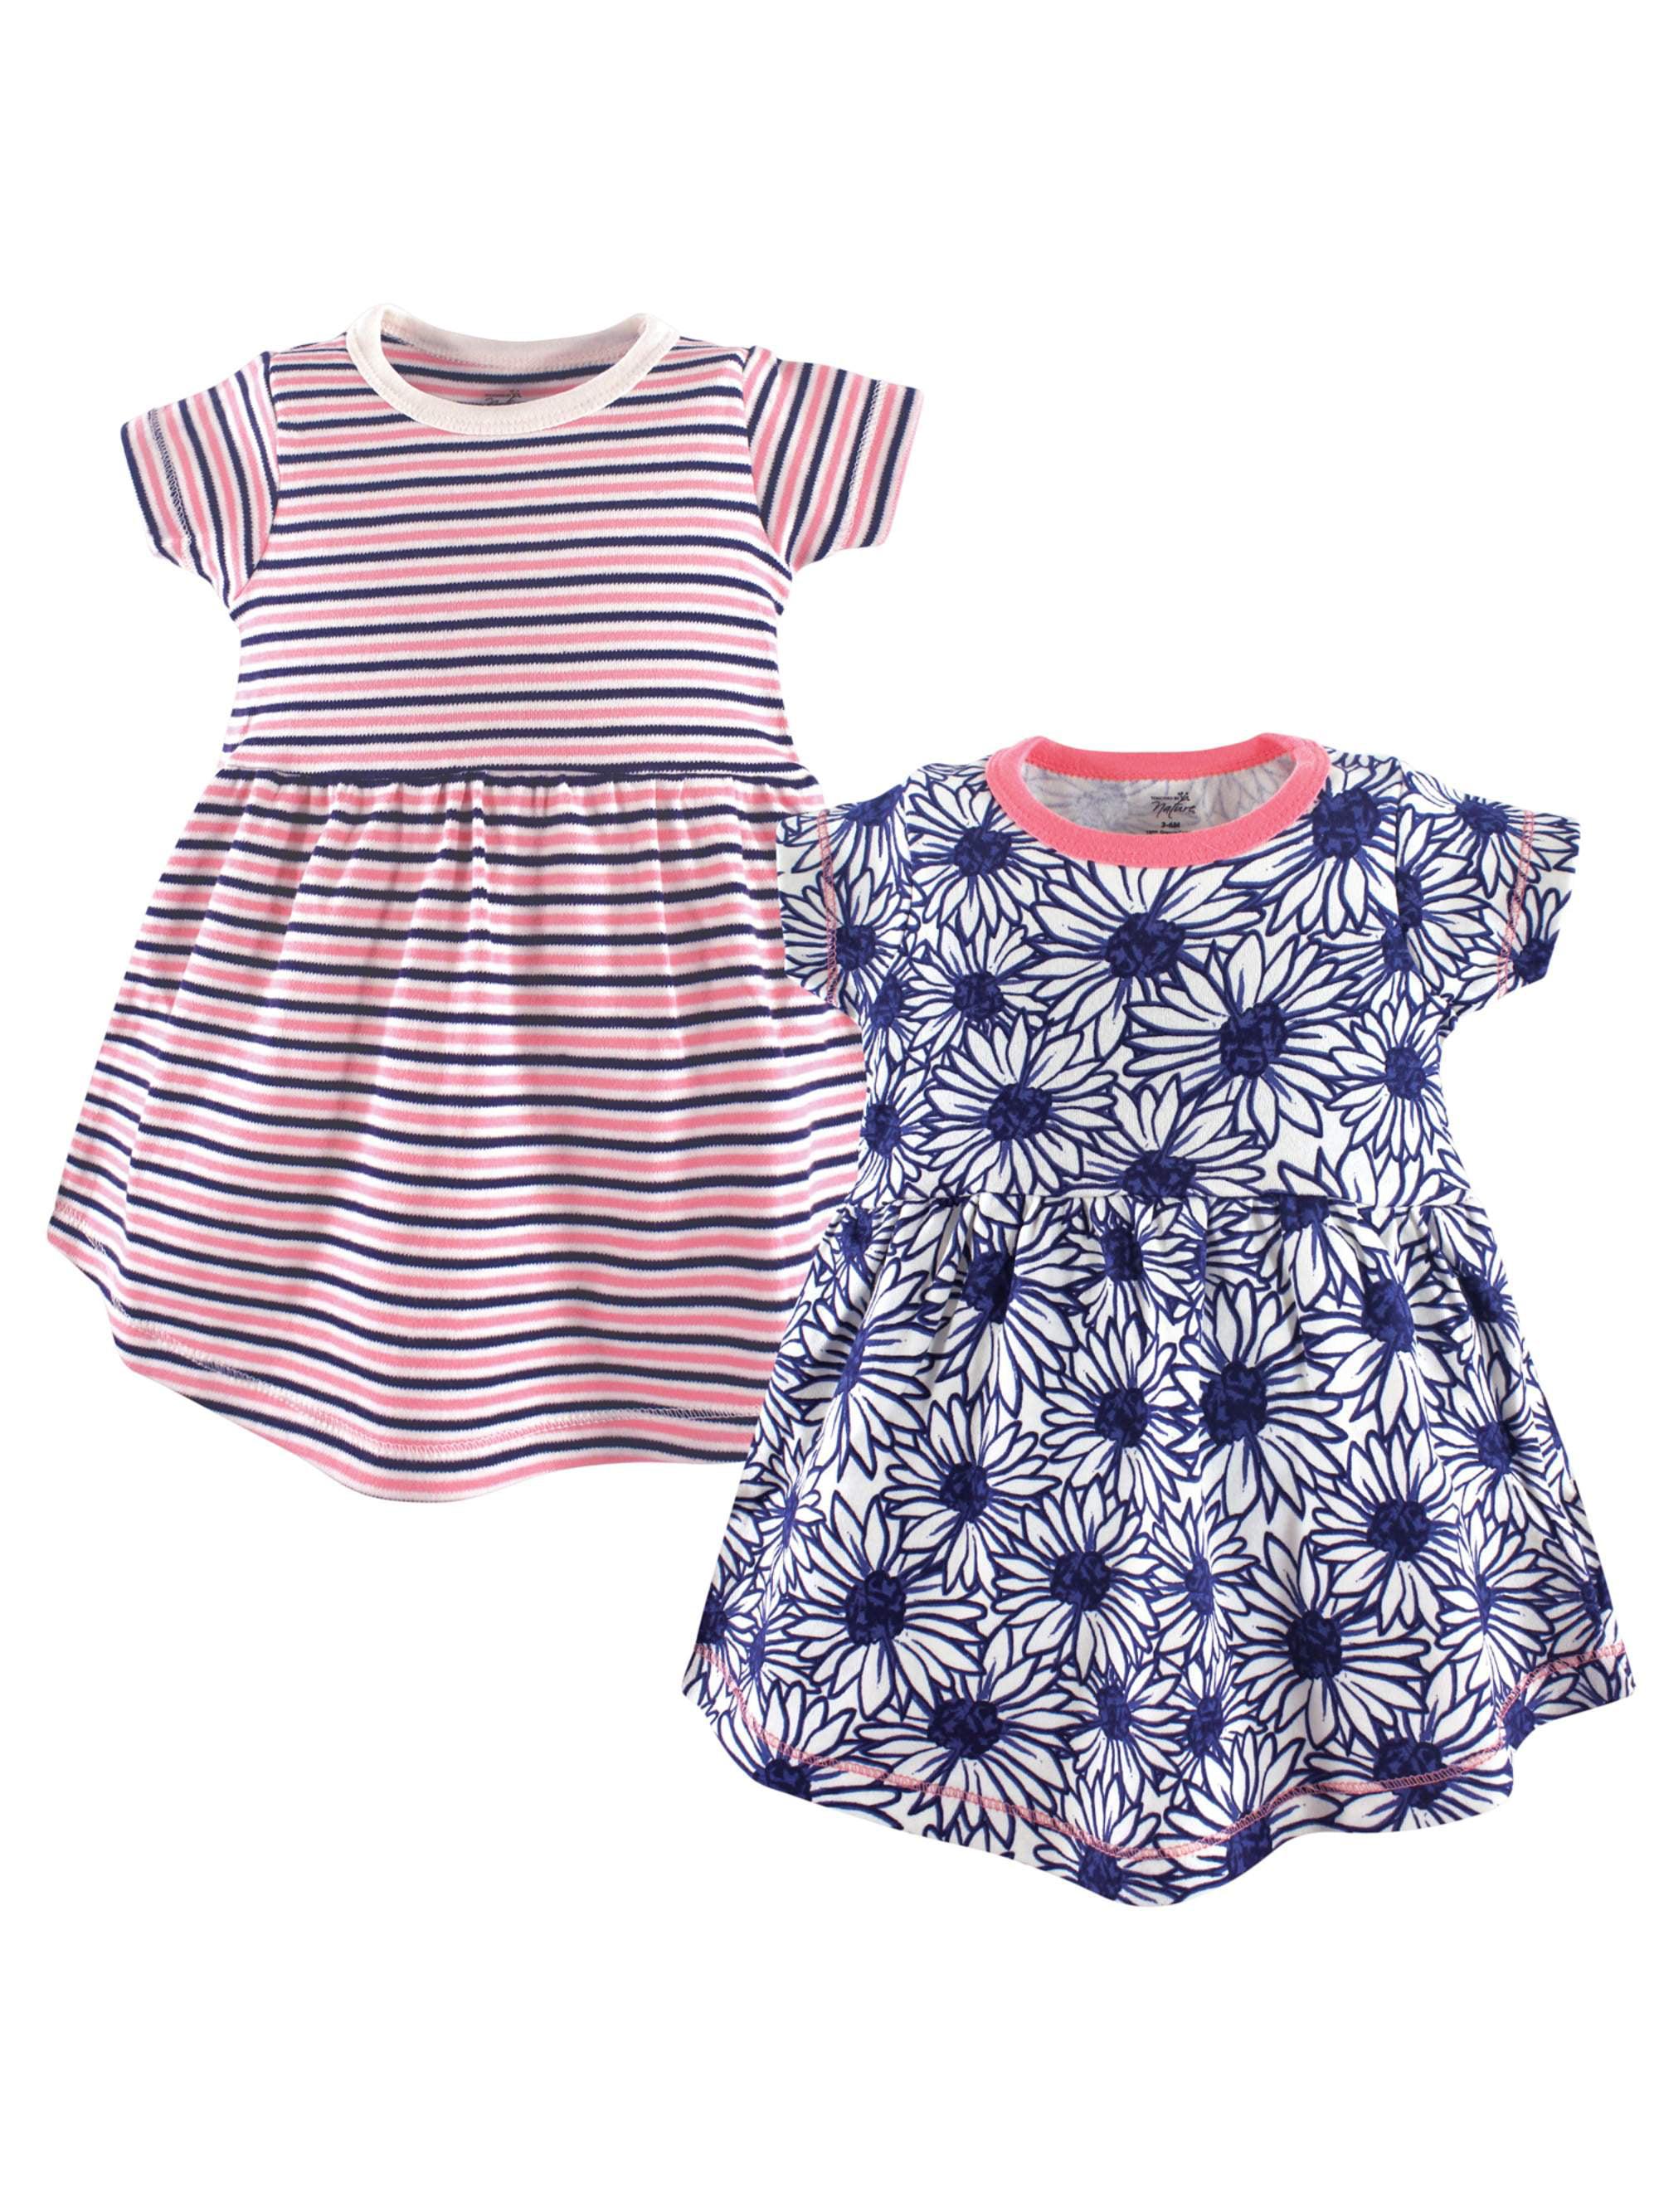 Organic Short Sleeve Cotton Dresses, 2-pack (Baby Girls)